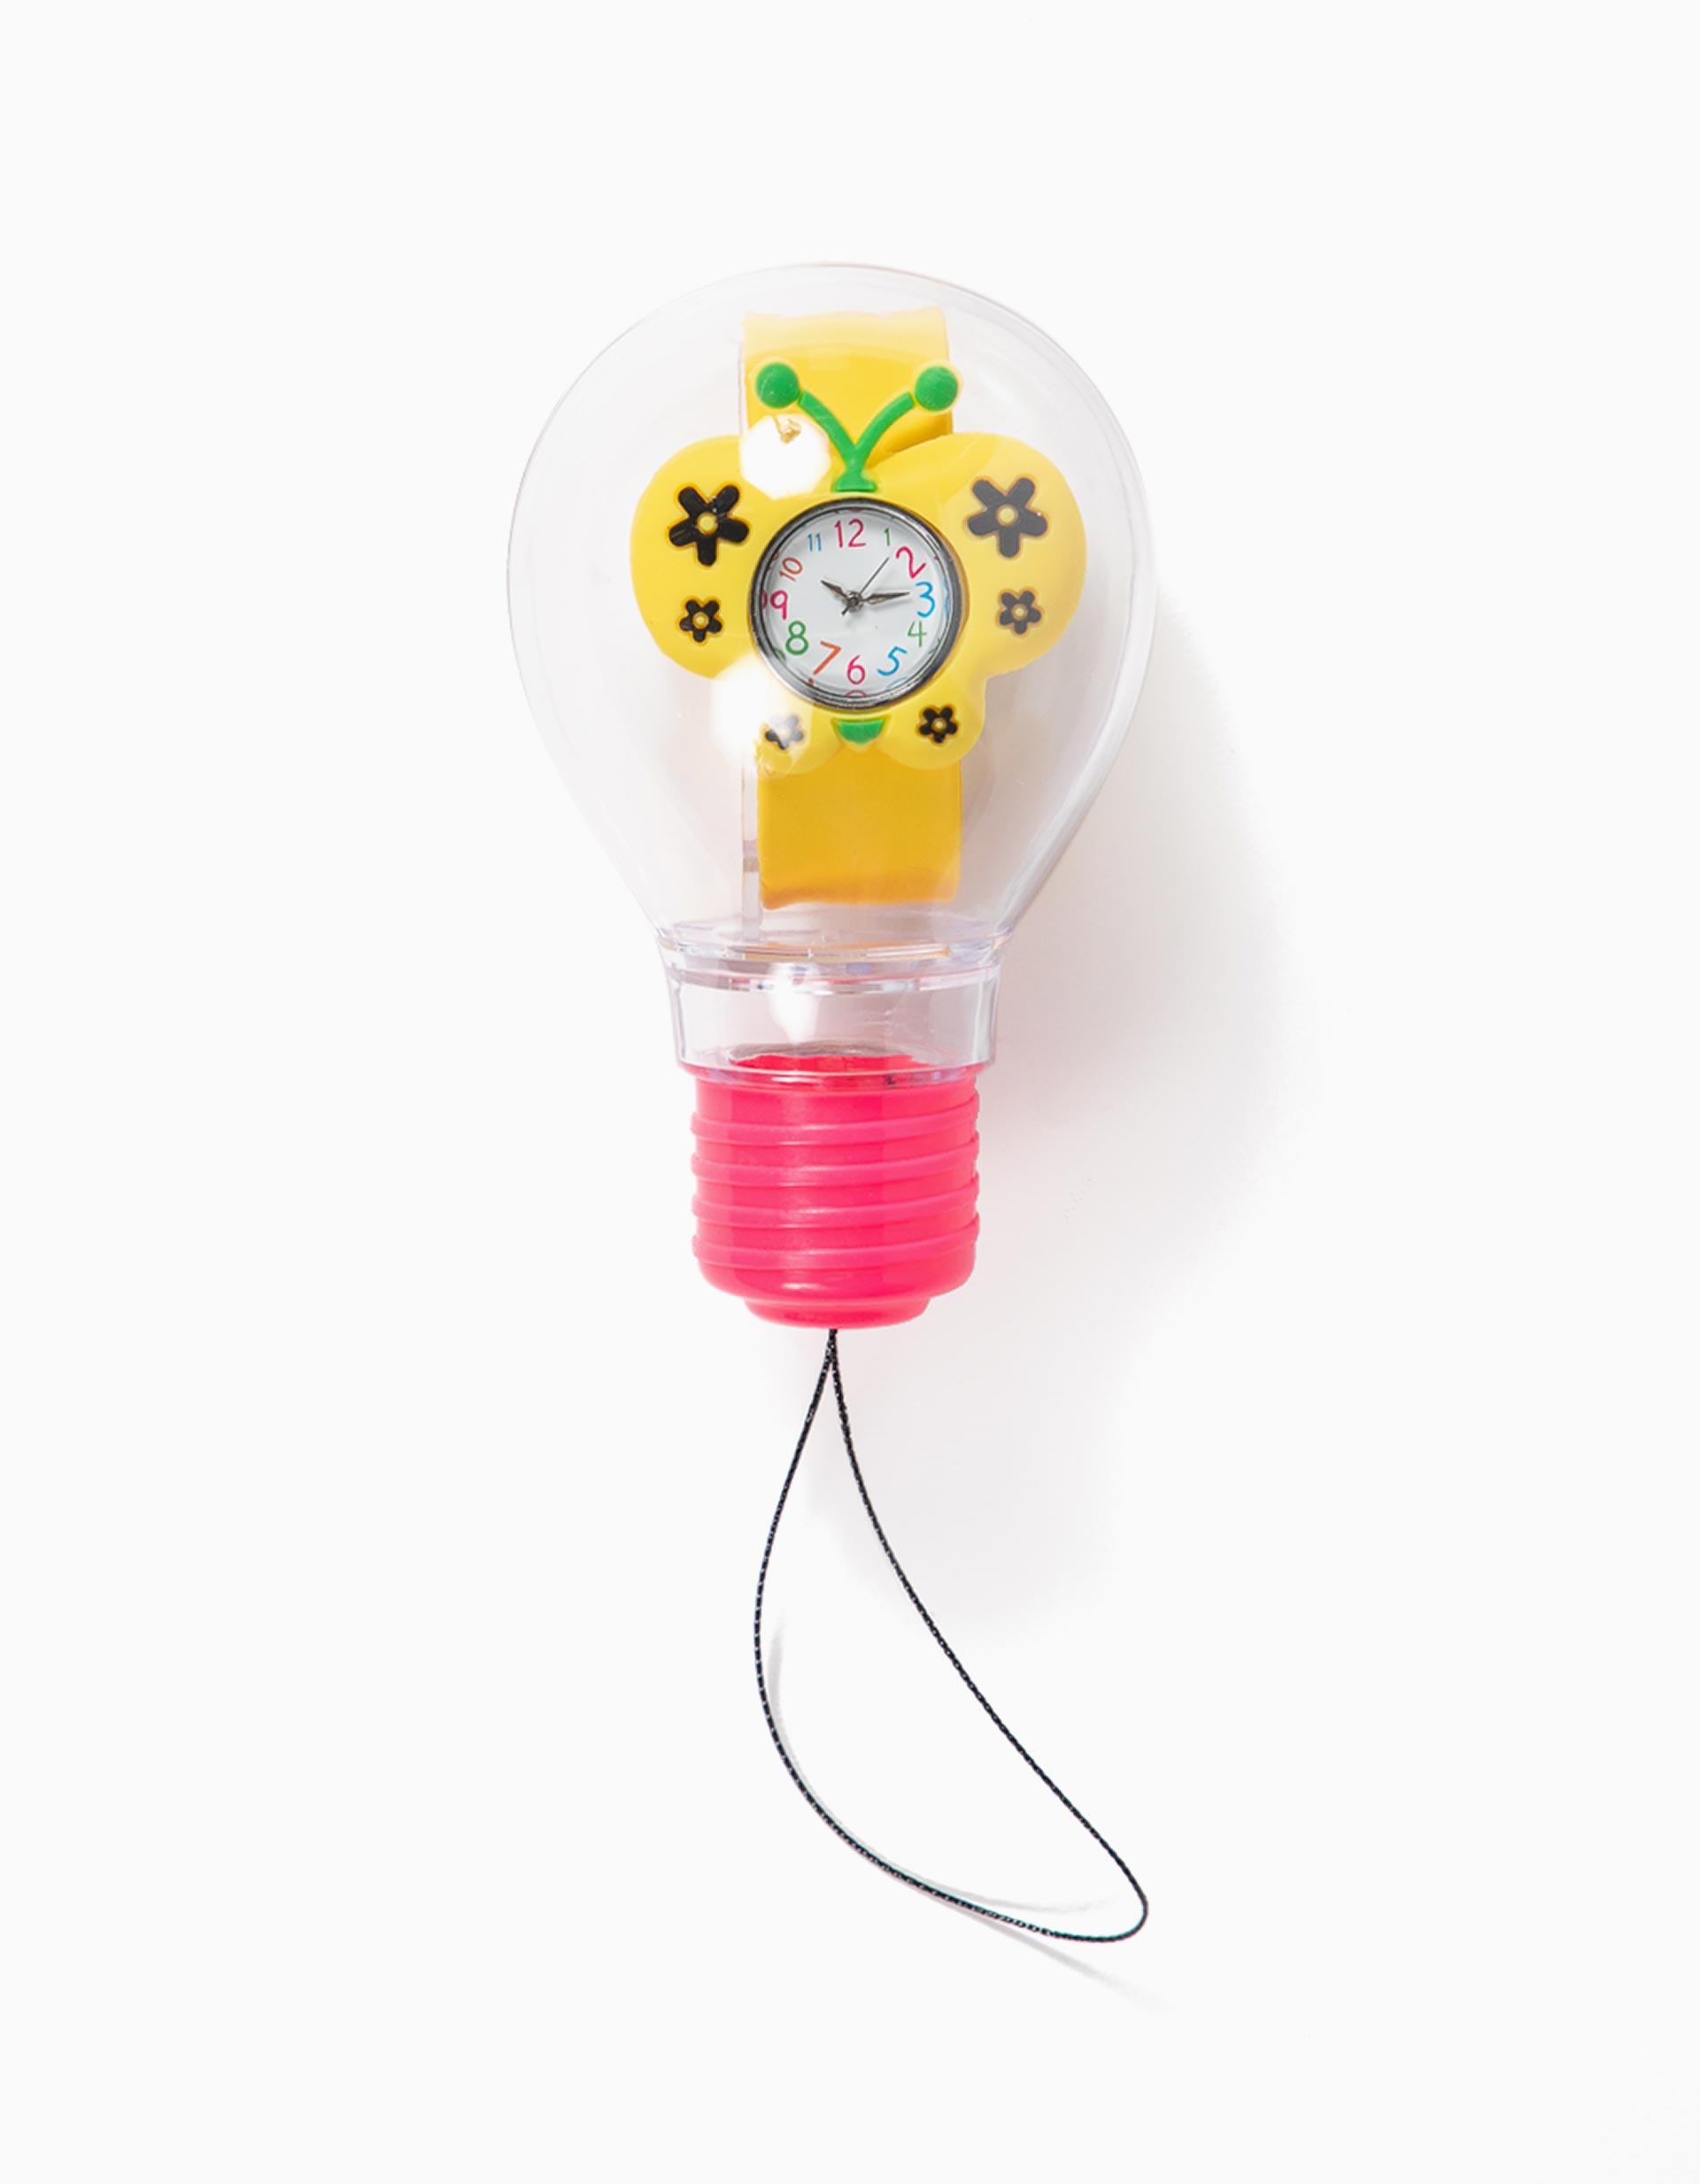 Relógio para Menina 'Butterfly', Amarelo